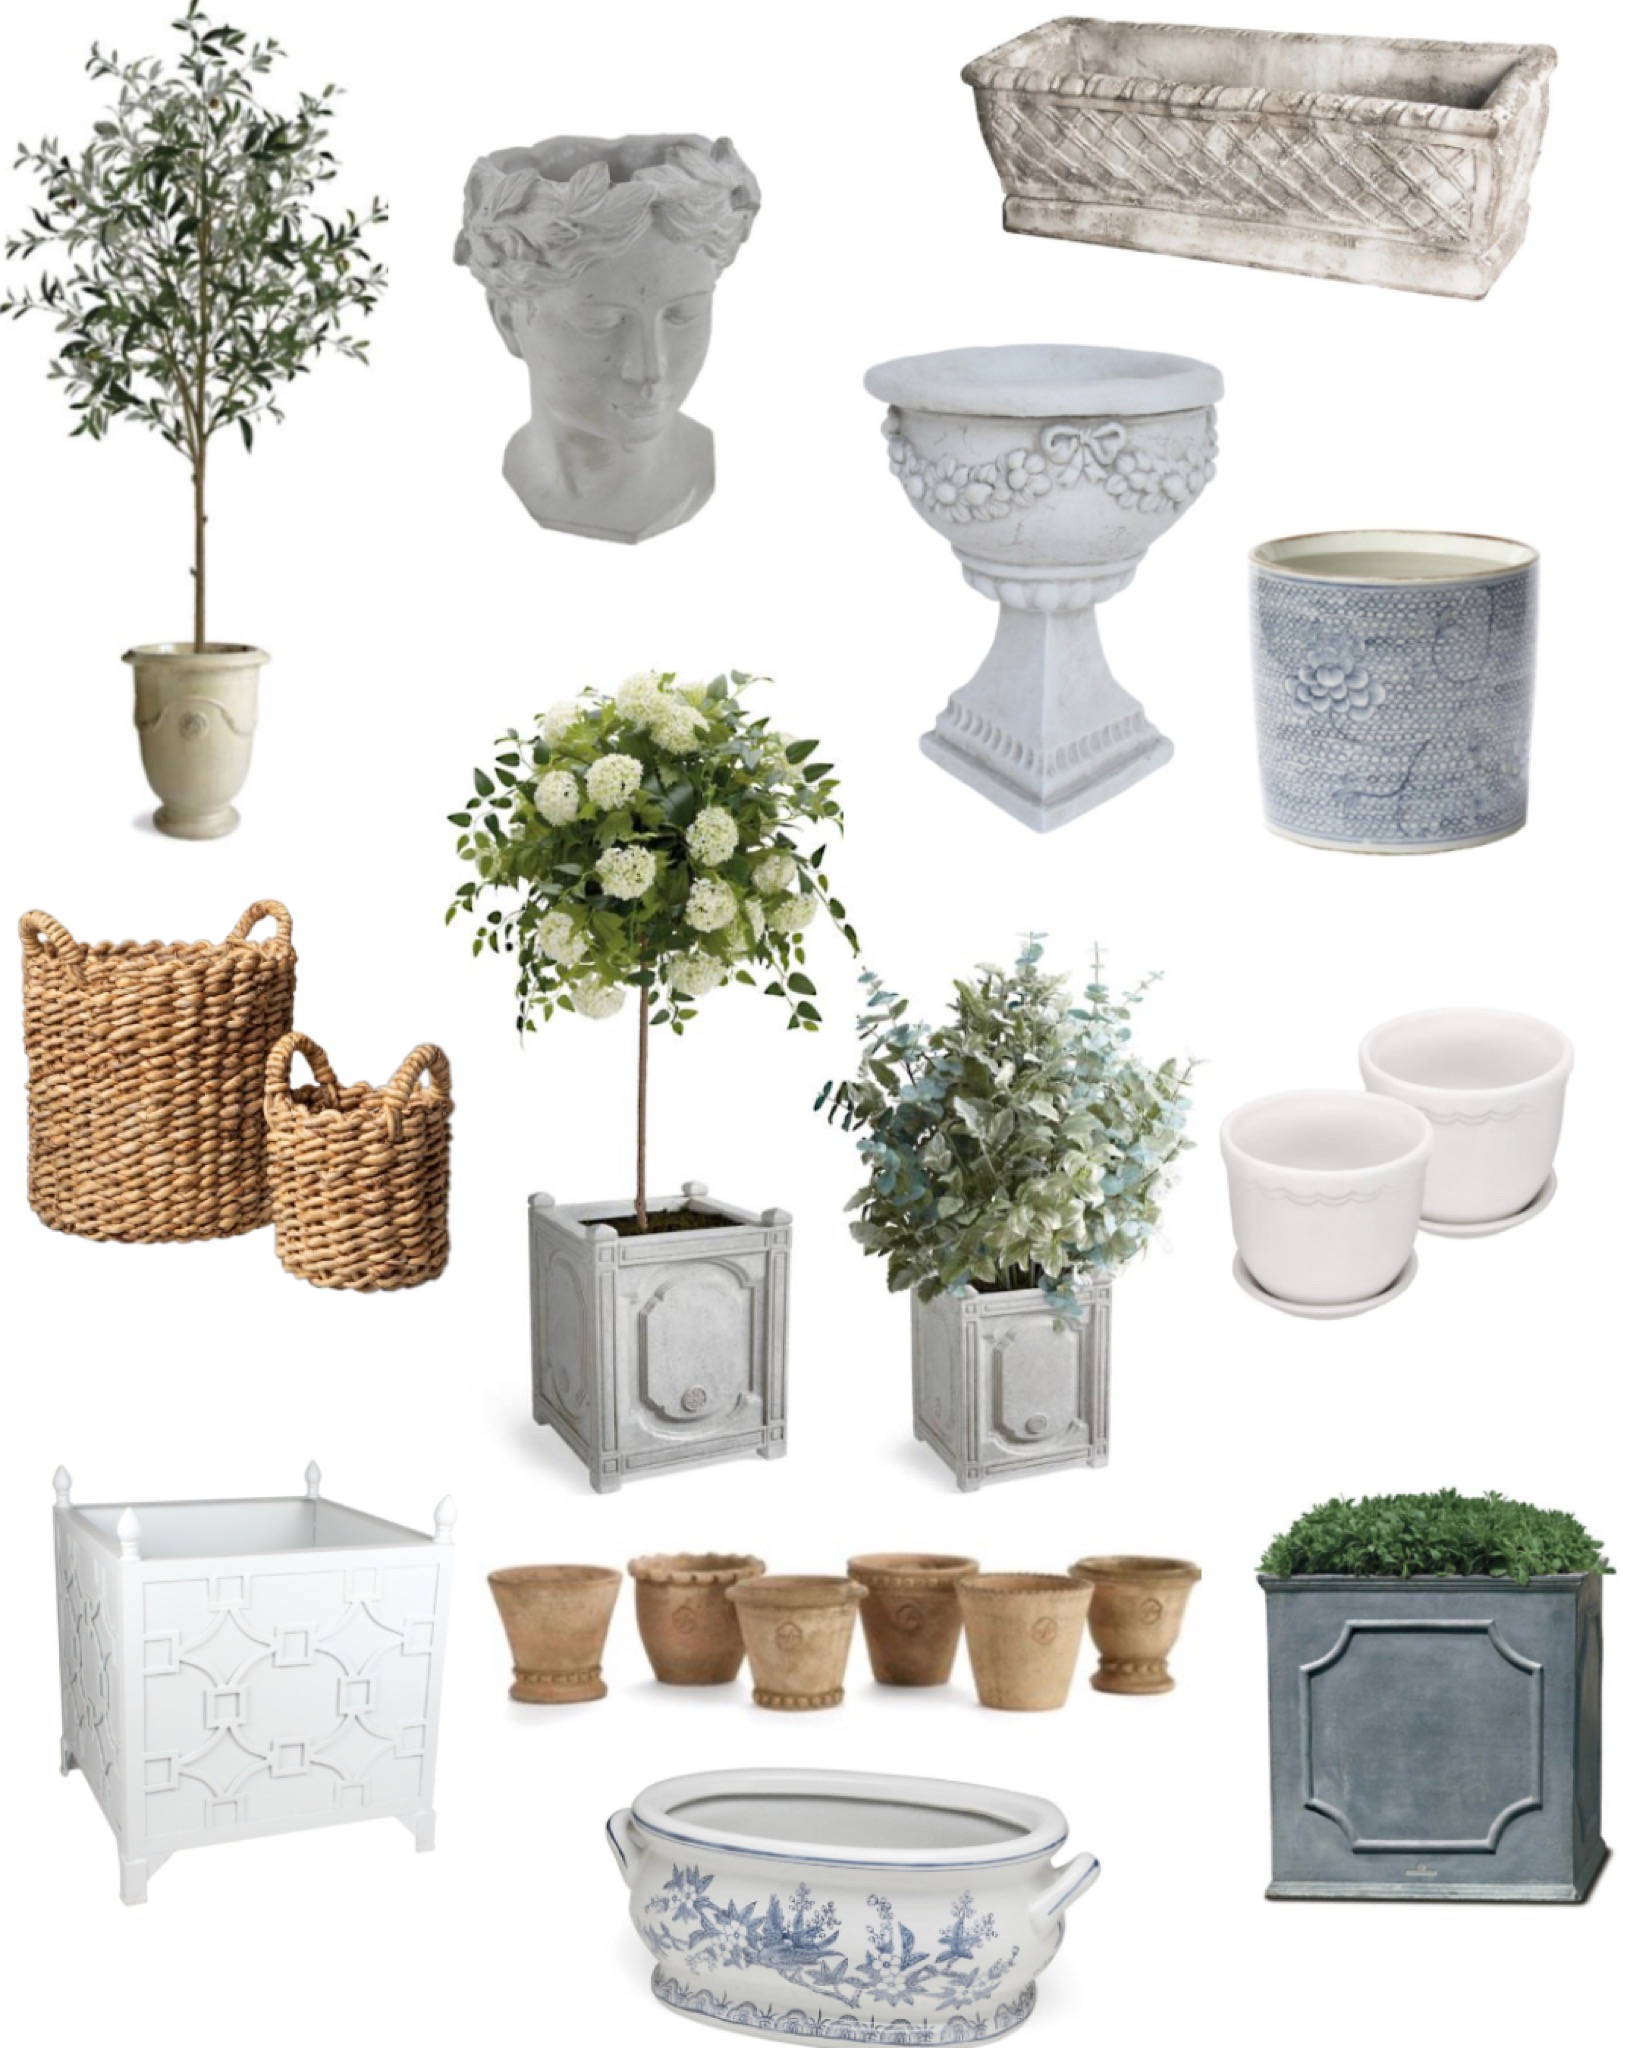 Planters & Urns